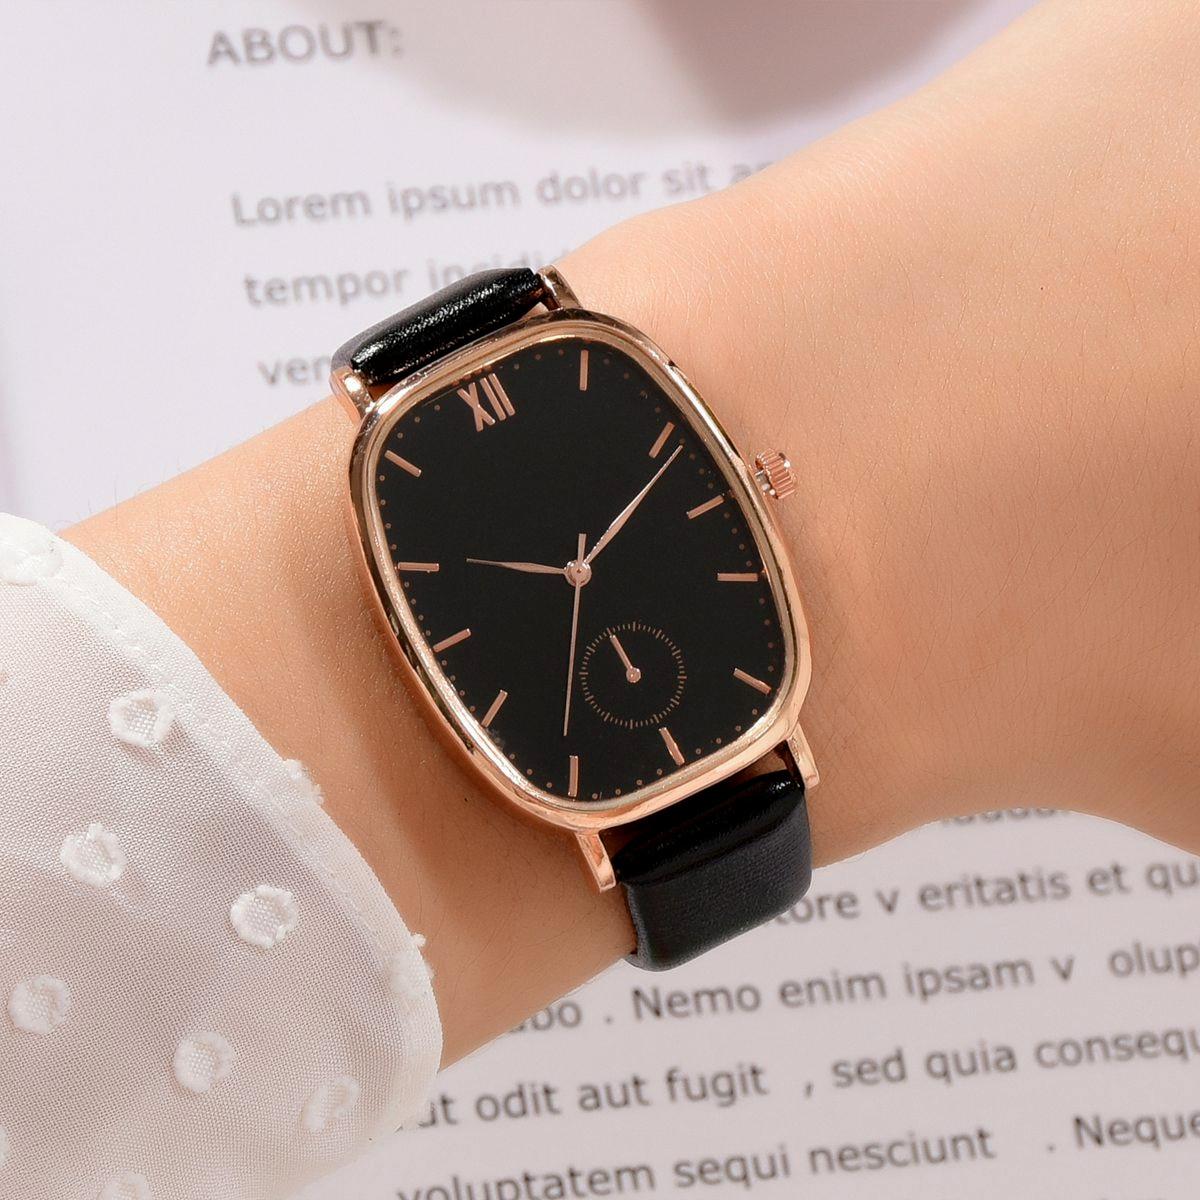 Luxury Brand Women Sports Watches Ladies Watch Genuine Leather Creative Montre Femme 2019 Relogio Feminino Woman Wrist Watch